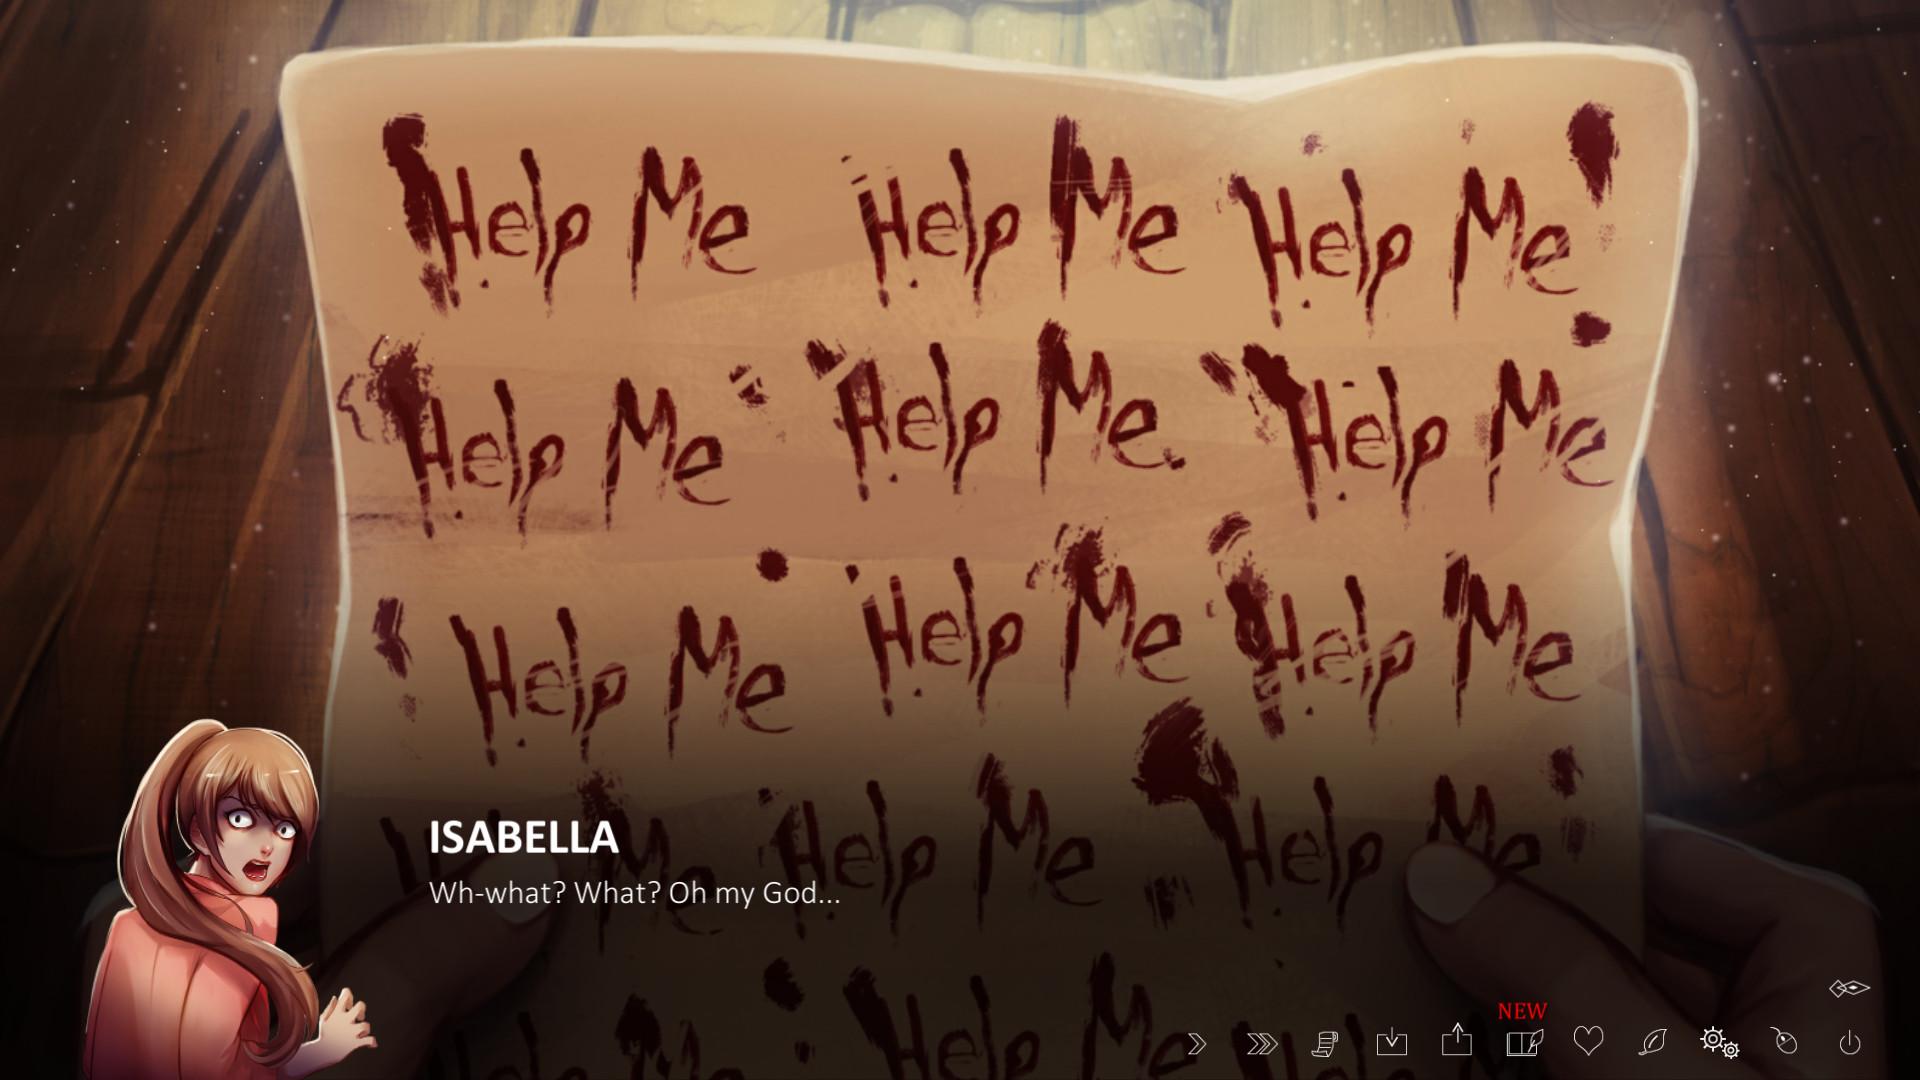 https://www.gamegrin.com/assets/games/the-letter-horror-visual-novel/screenshots/the-letter-horror-visual-novel-screenshot-1.jpg